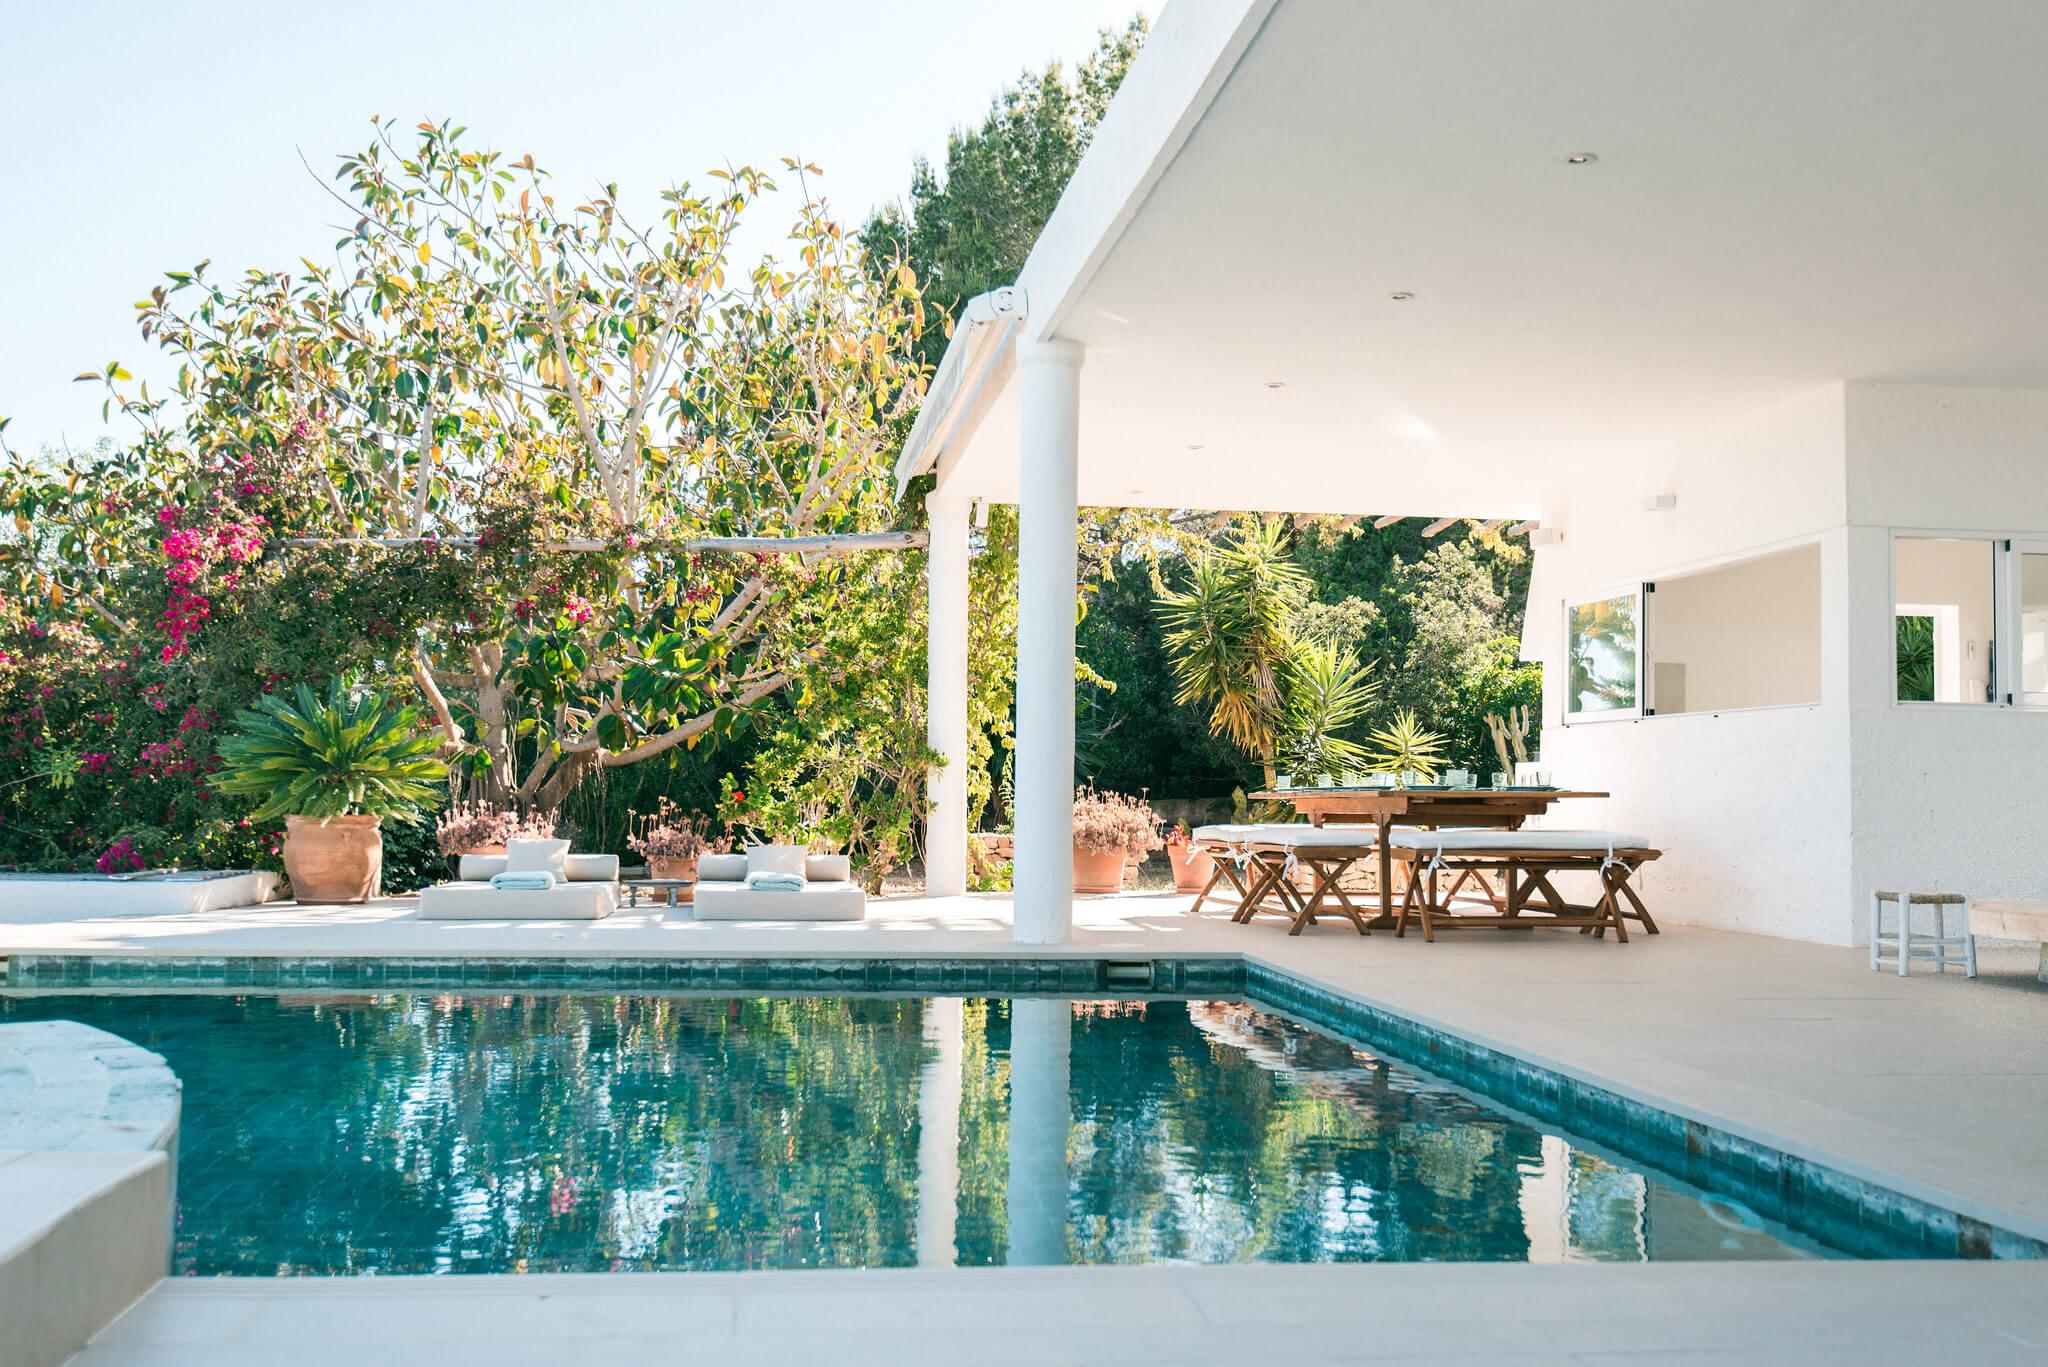 https://www.white-ibiza.com/wp-content/uploads/2020/06/white-ibiza-villas-casa-odette-exterior-pool-evening.jpg